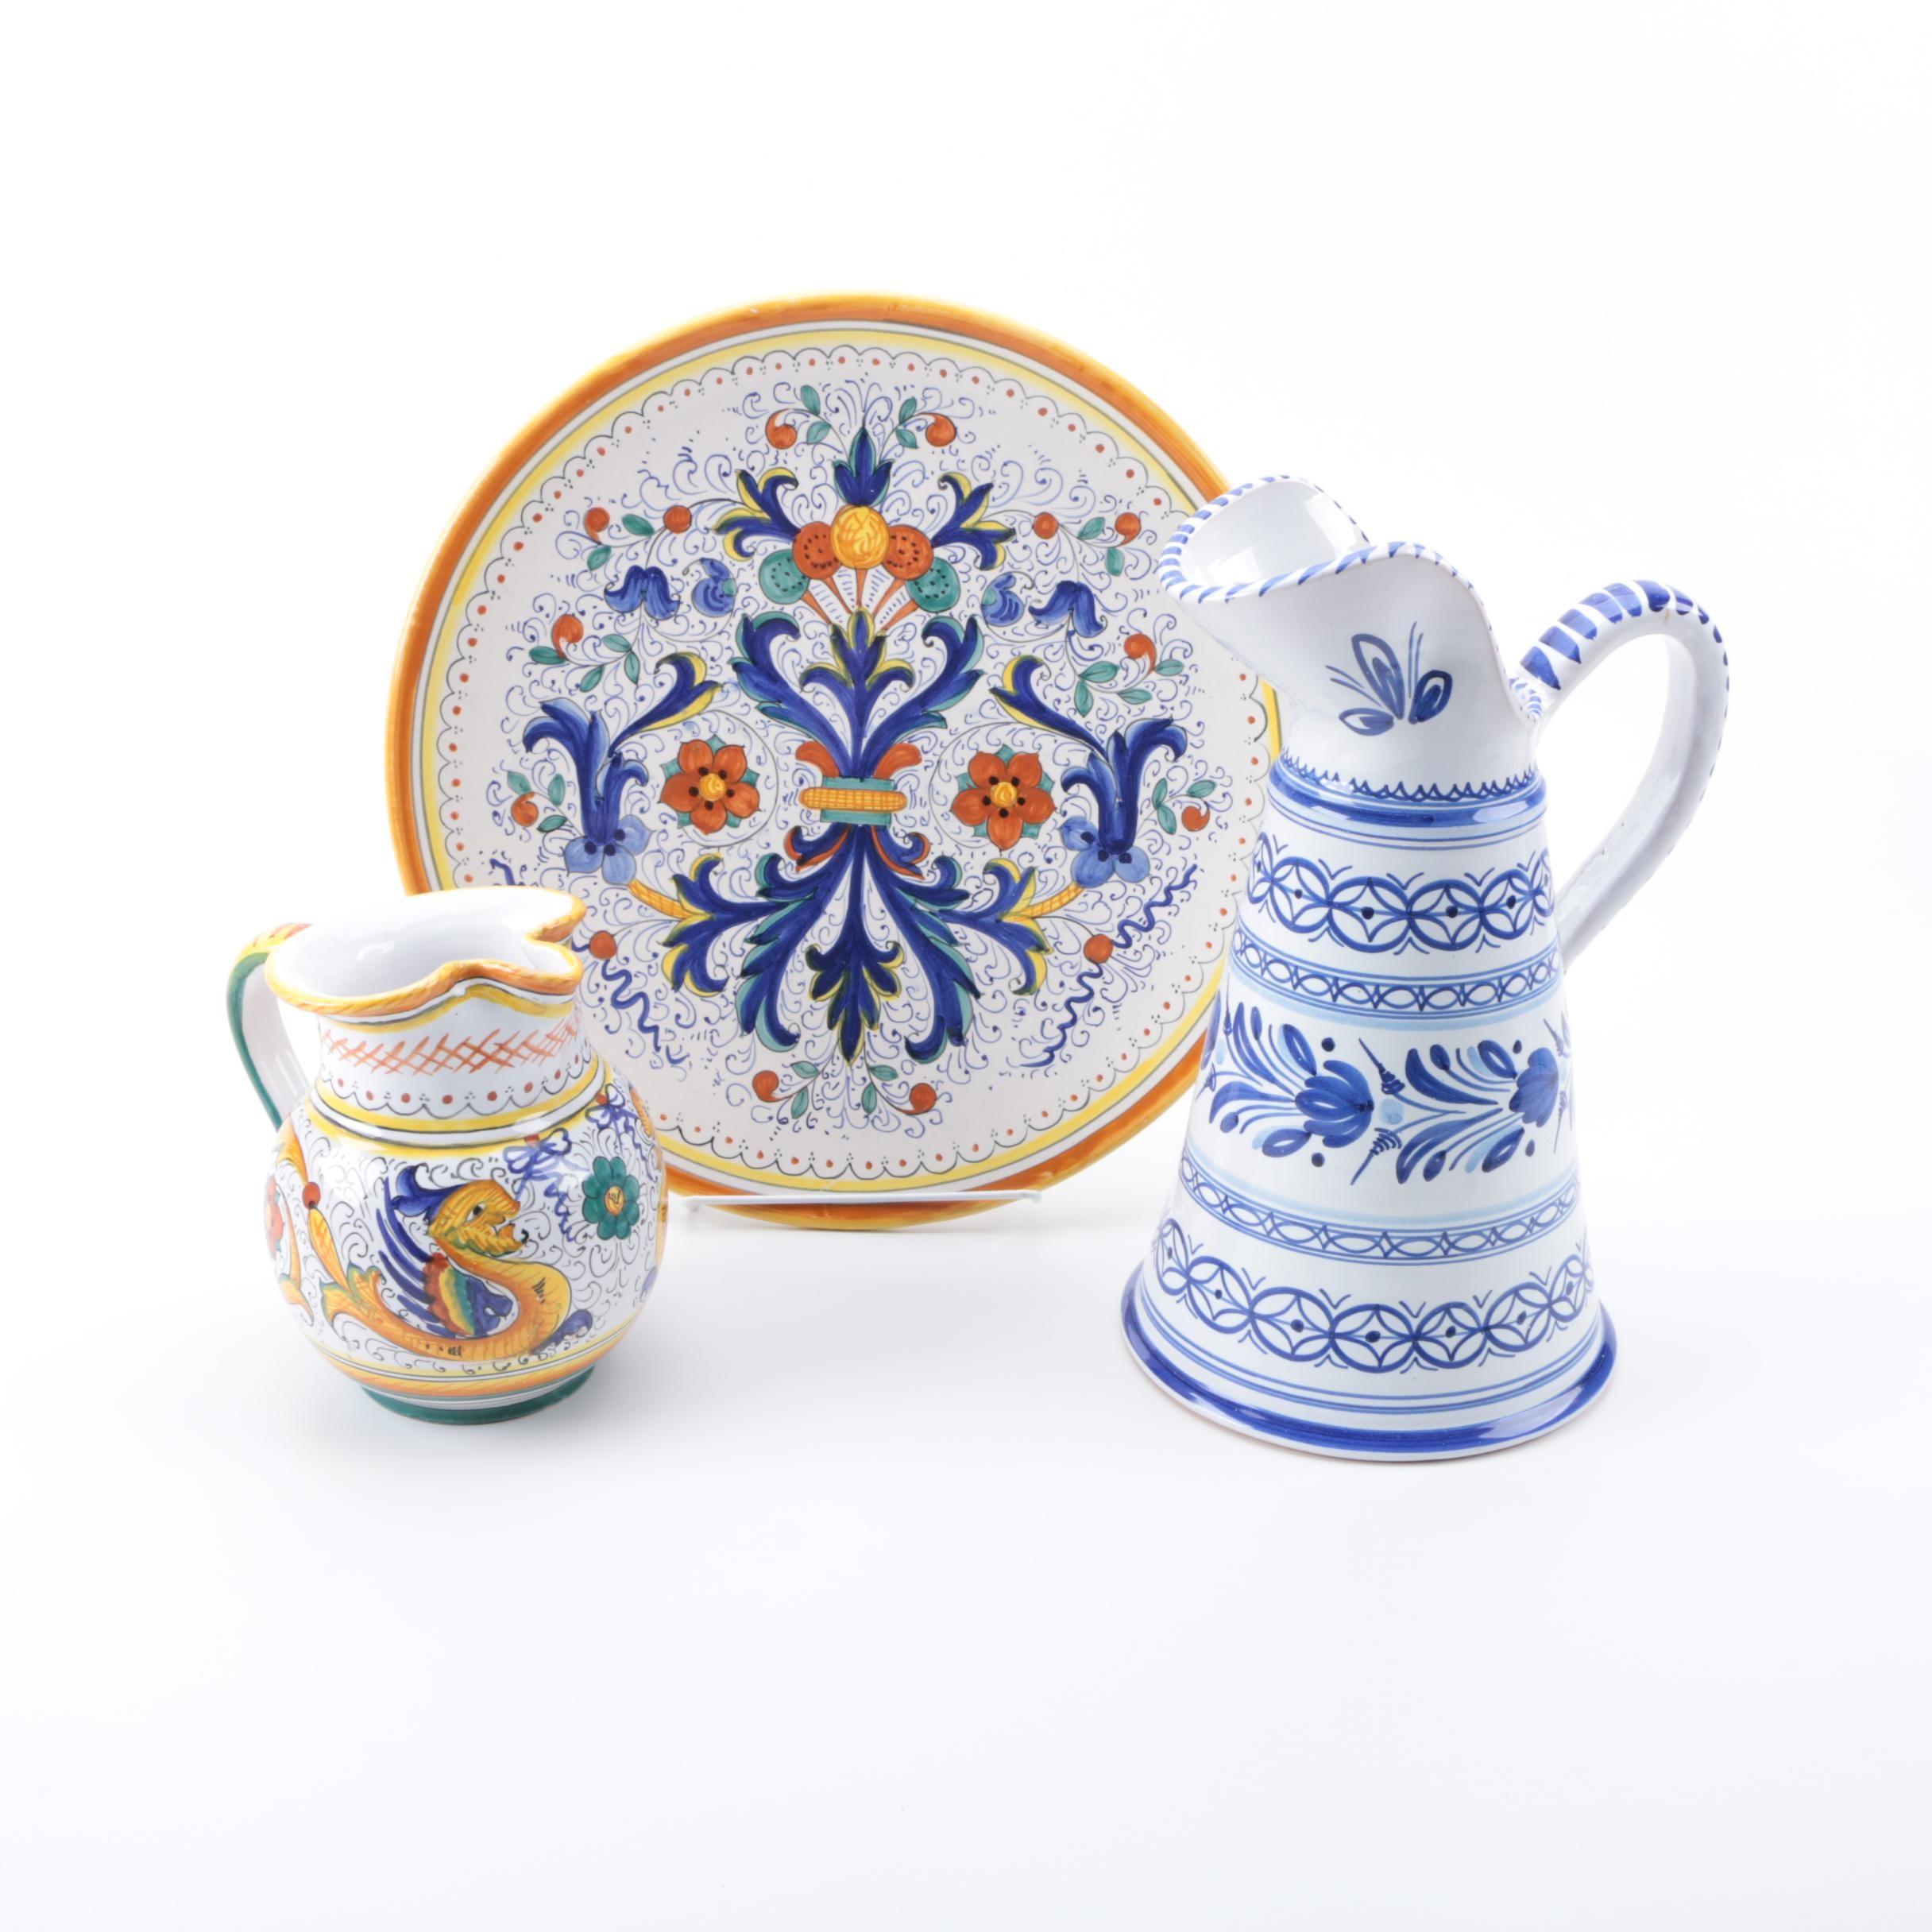 Assortment of Hand Painted Spanish and Italian Majolica Pottery